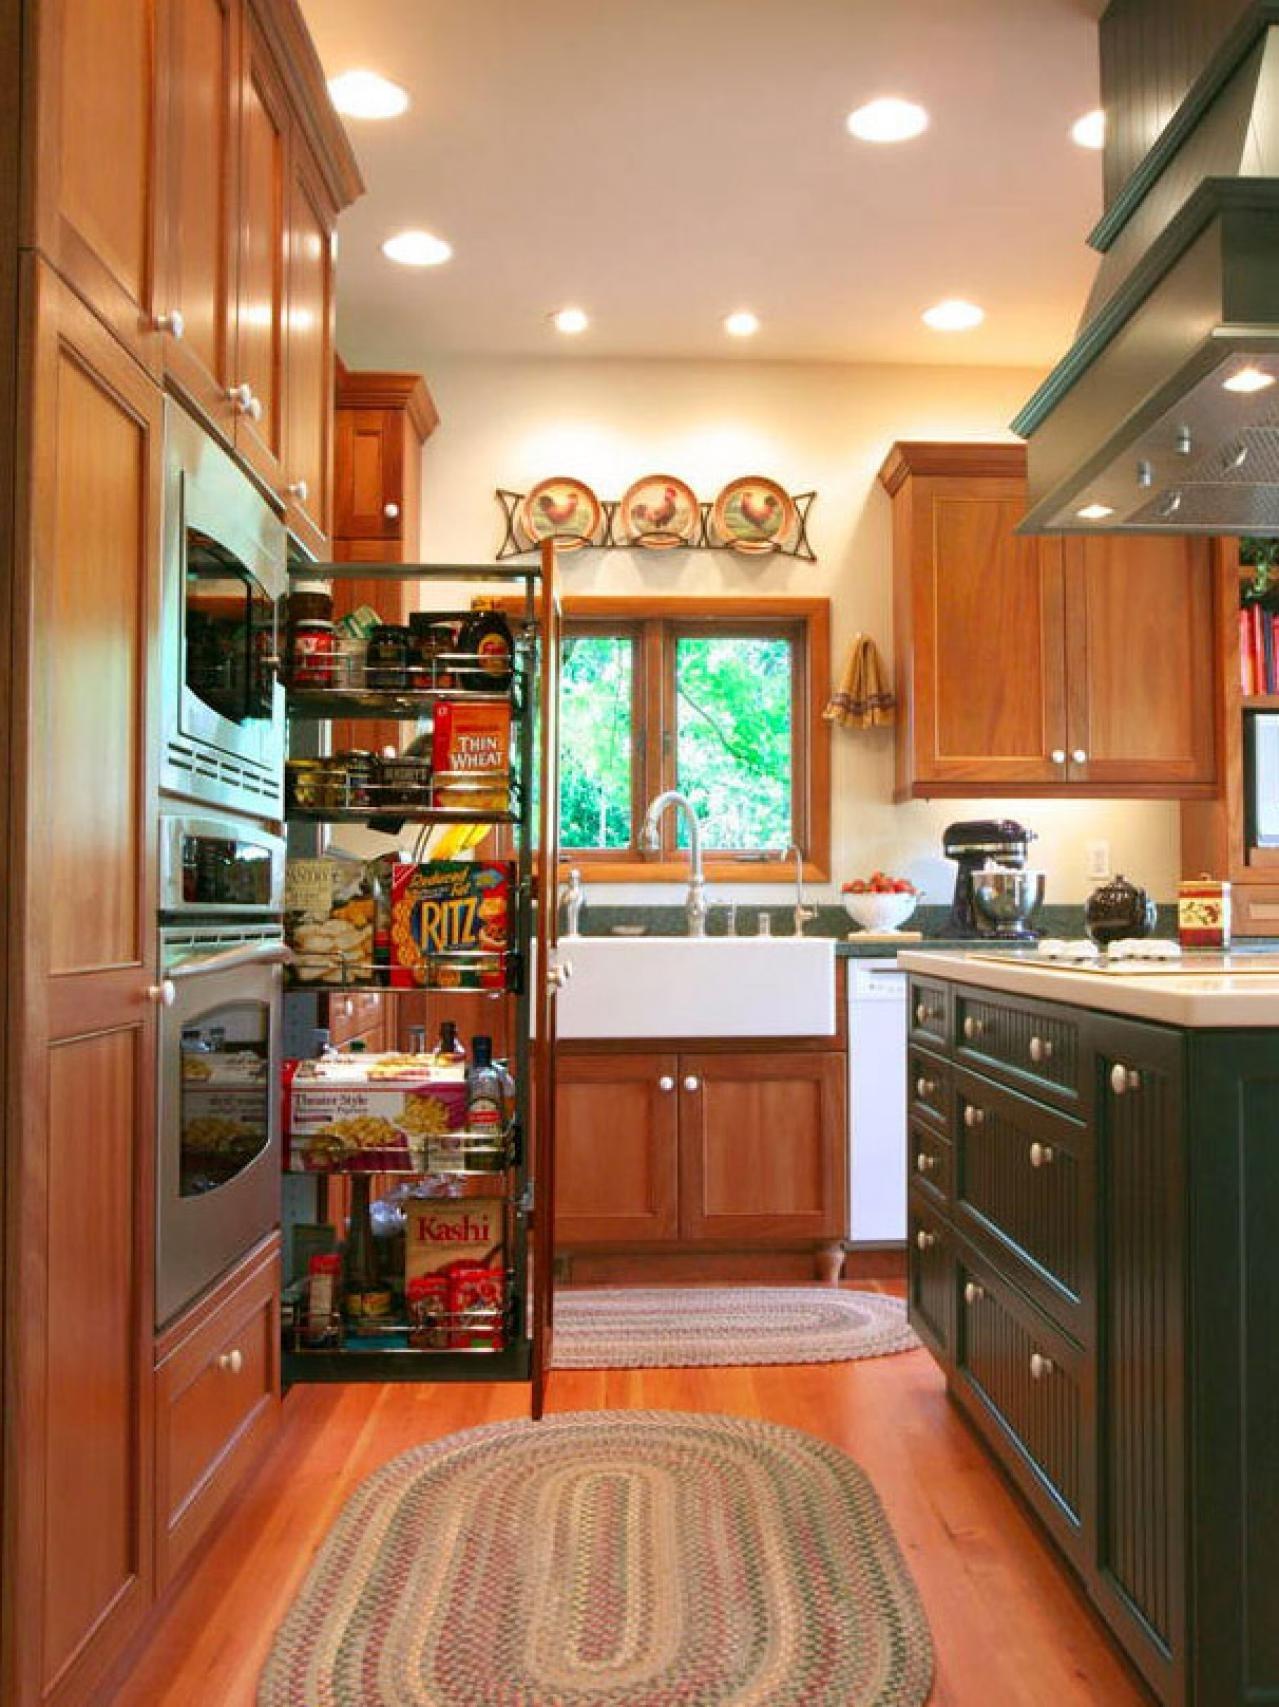 10 Wonderful Pantry Ideas For Small Kitchen %name 2020